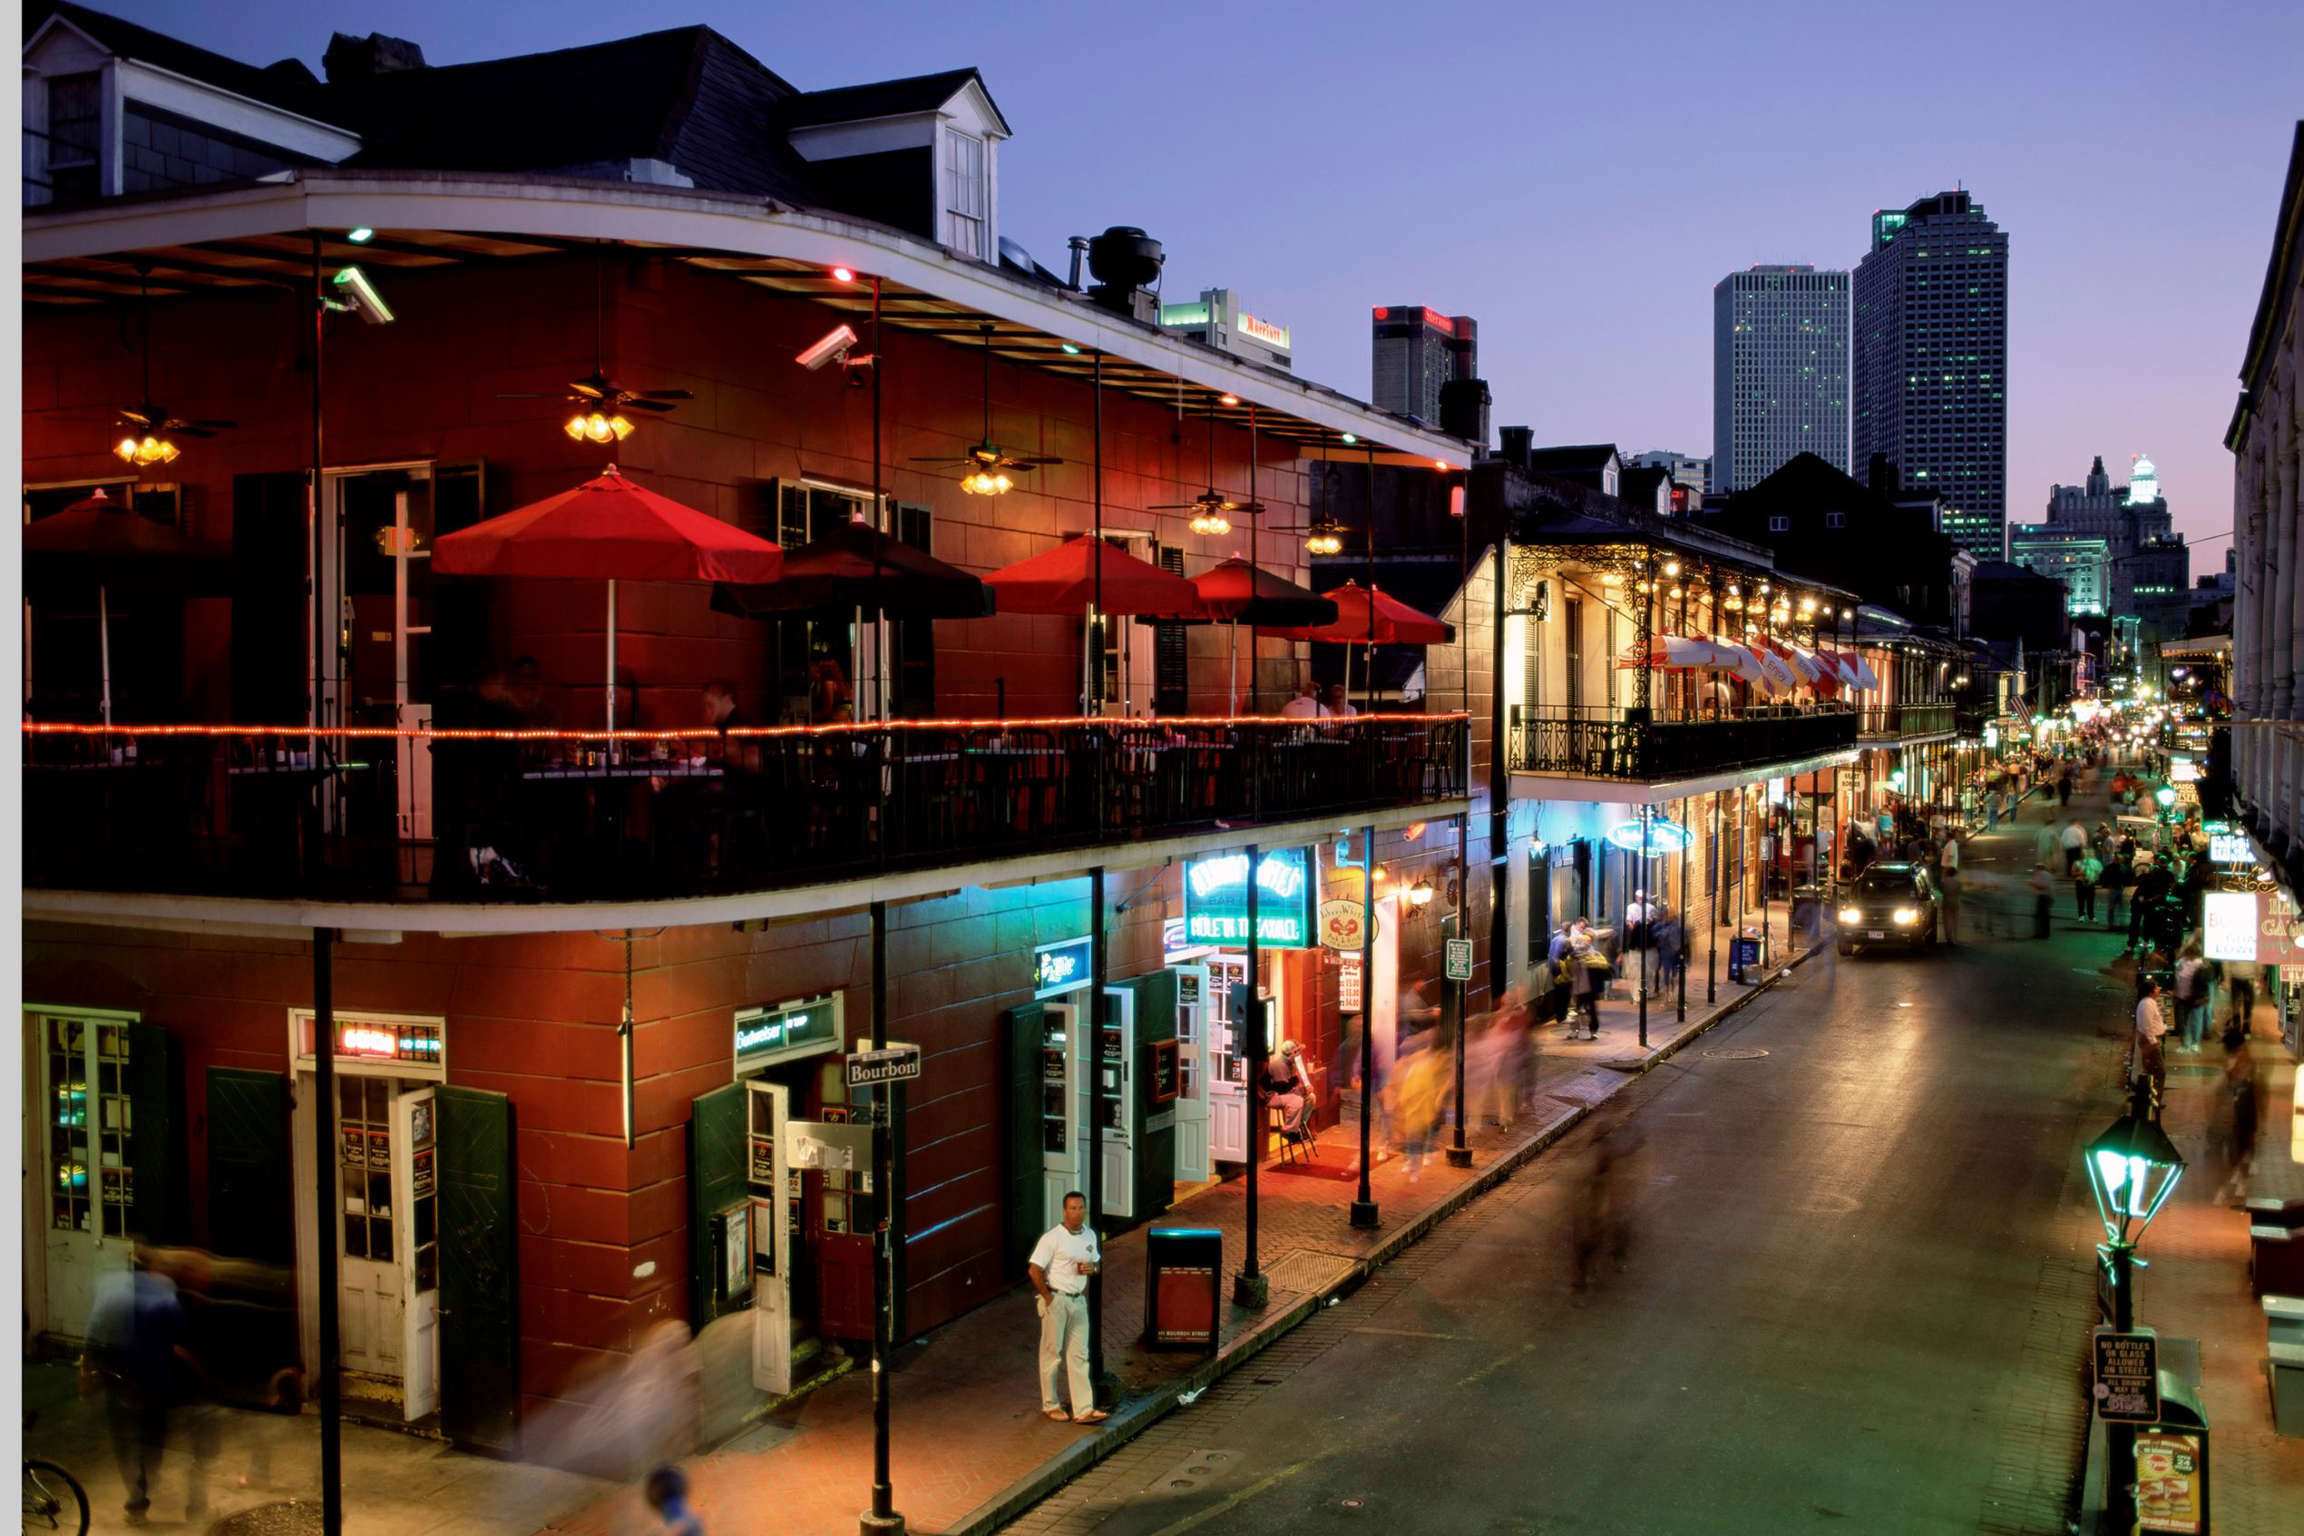 City skyline and Bourbon Street, New Orleans, Louisiana, United States